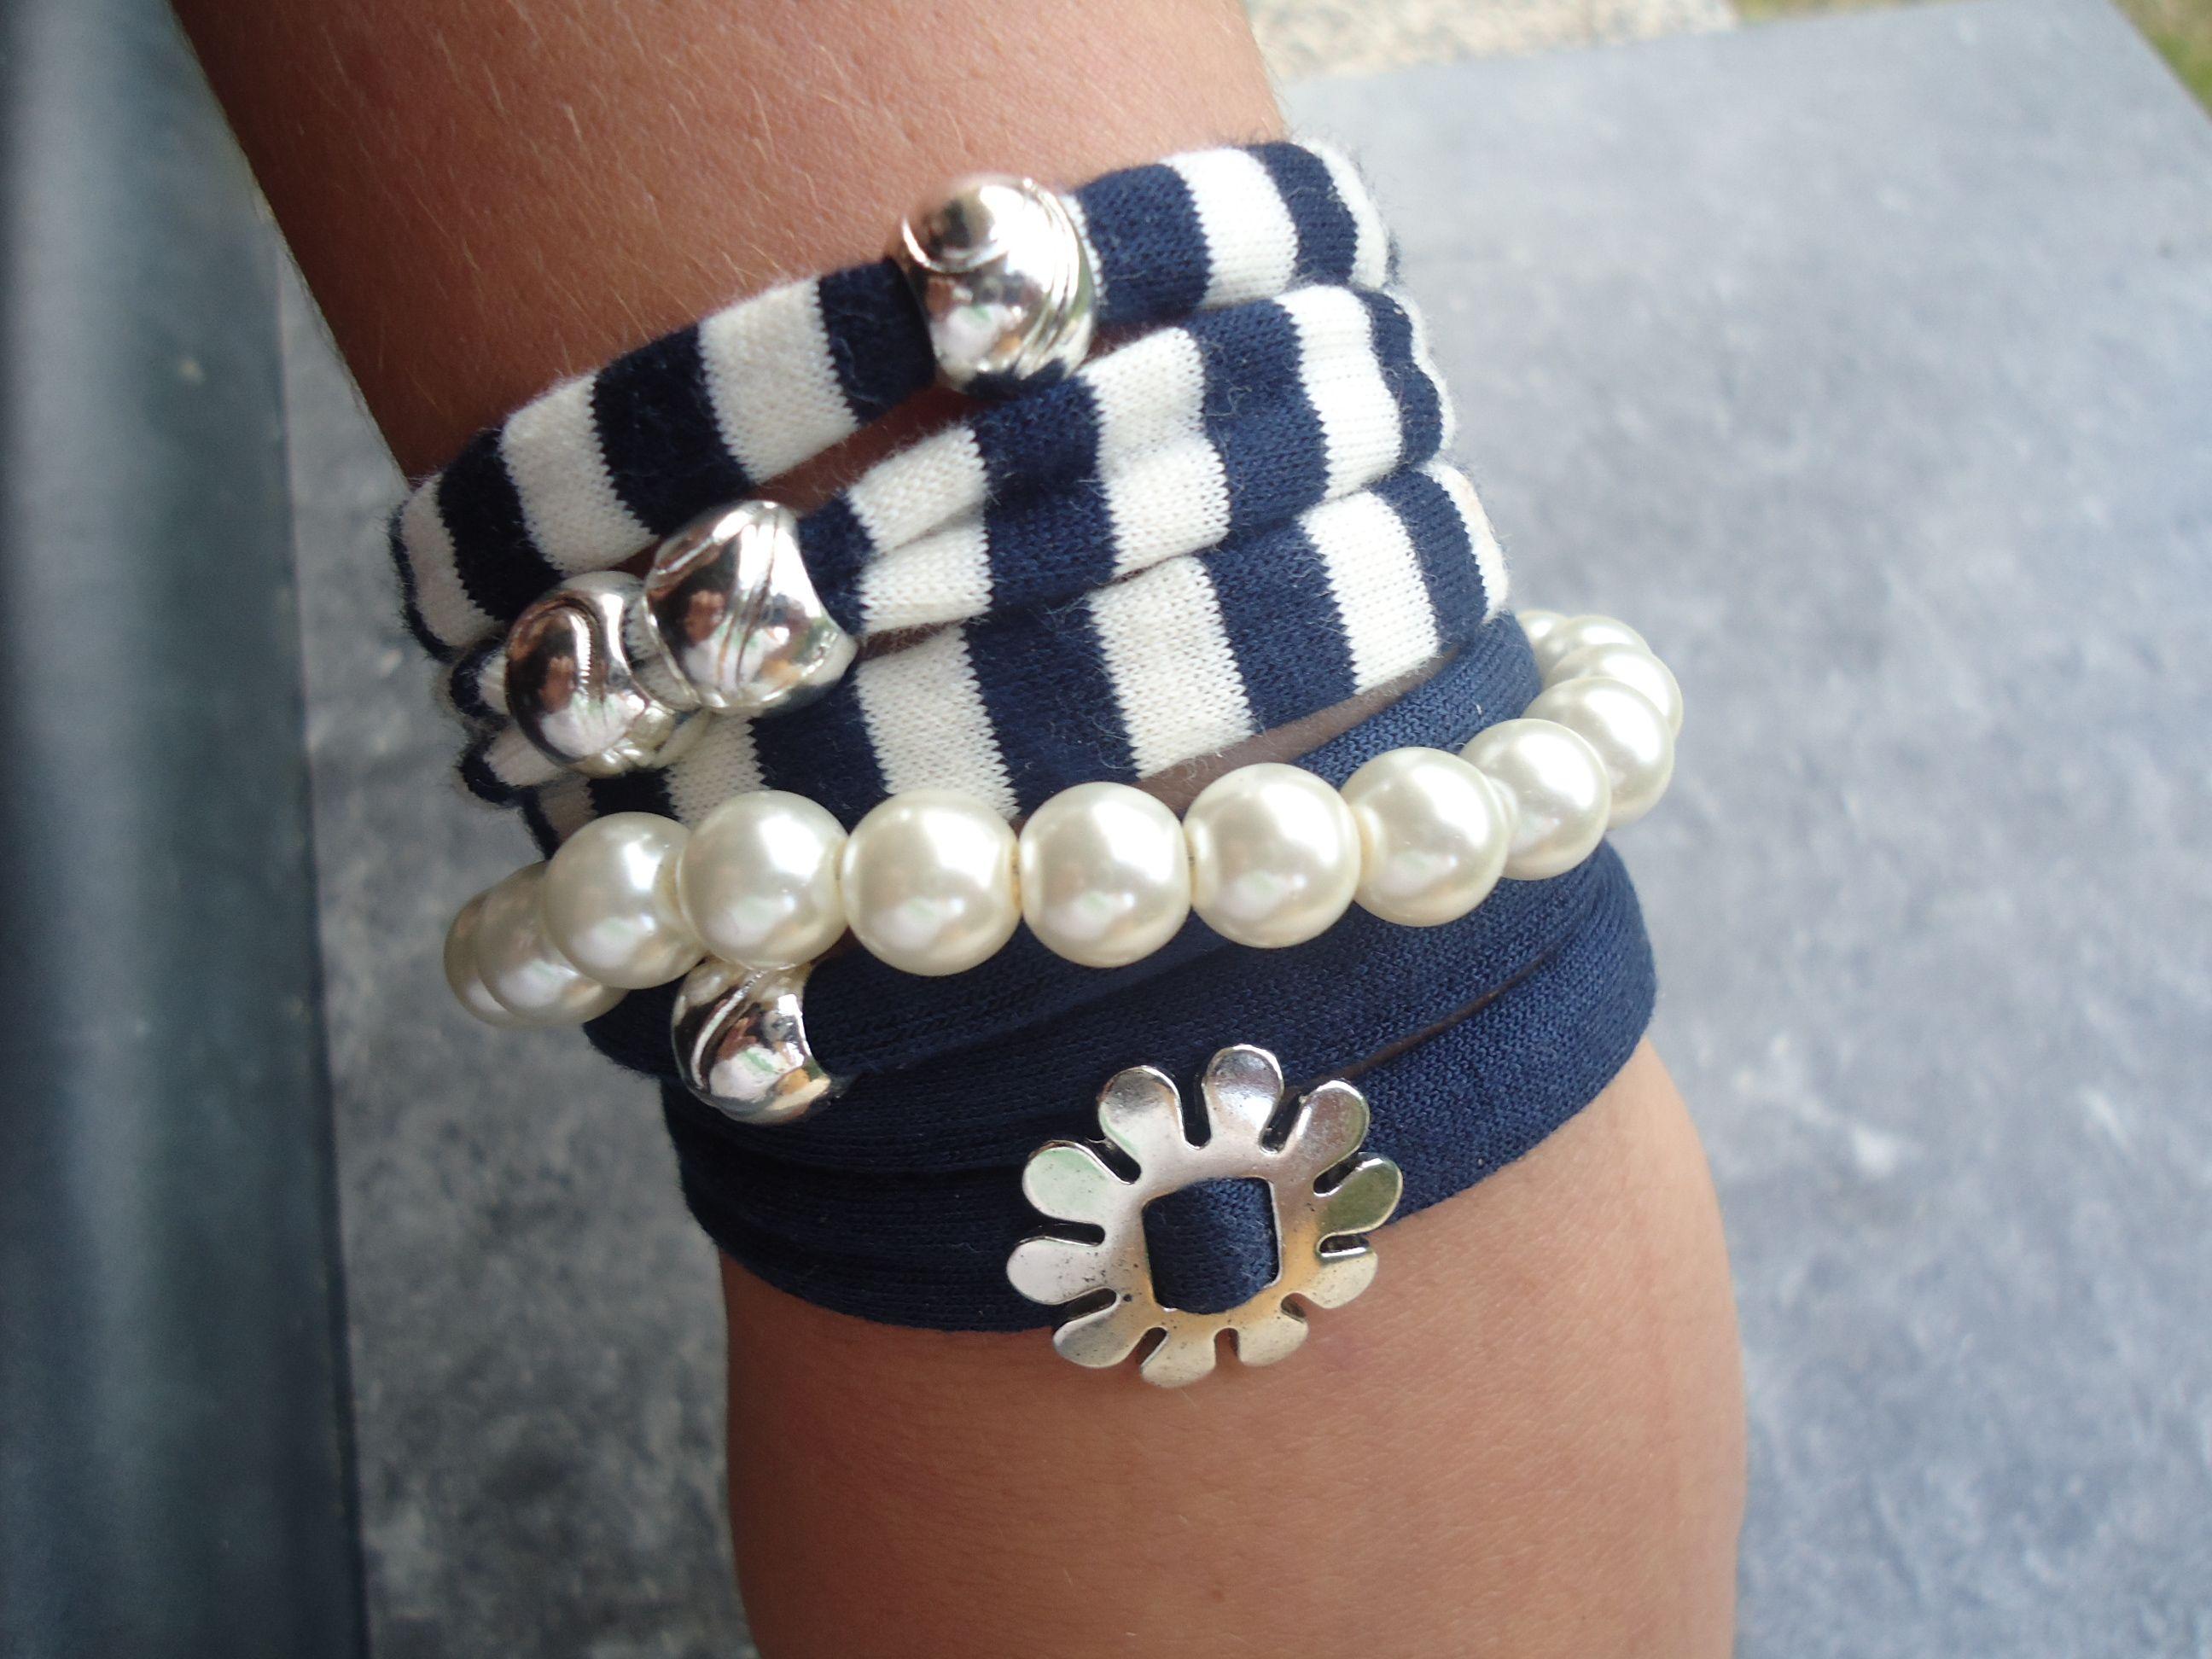 Conjunt de braçalets cotó amb peçes plata tibetana i braçalet perles. byusbisuteria.blogspot.com